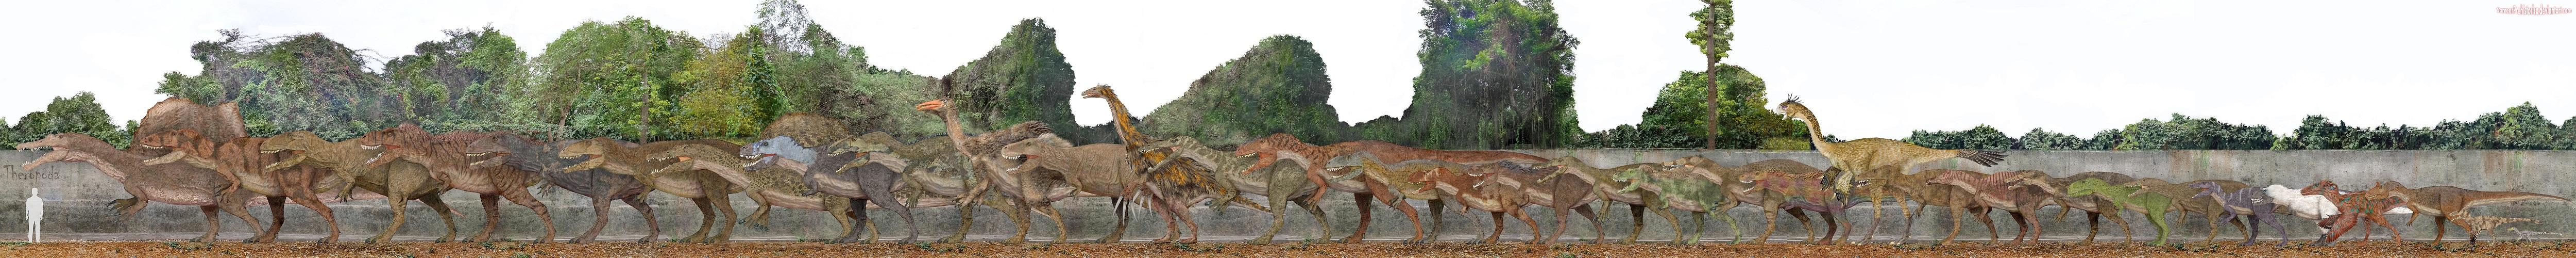 Theropoda by SameerPrehistorica